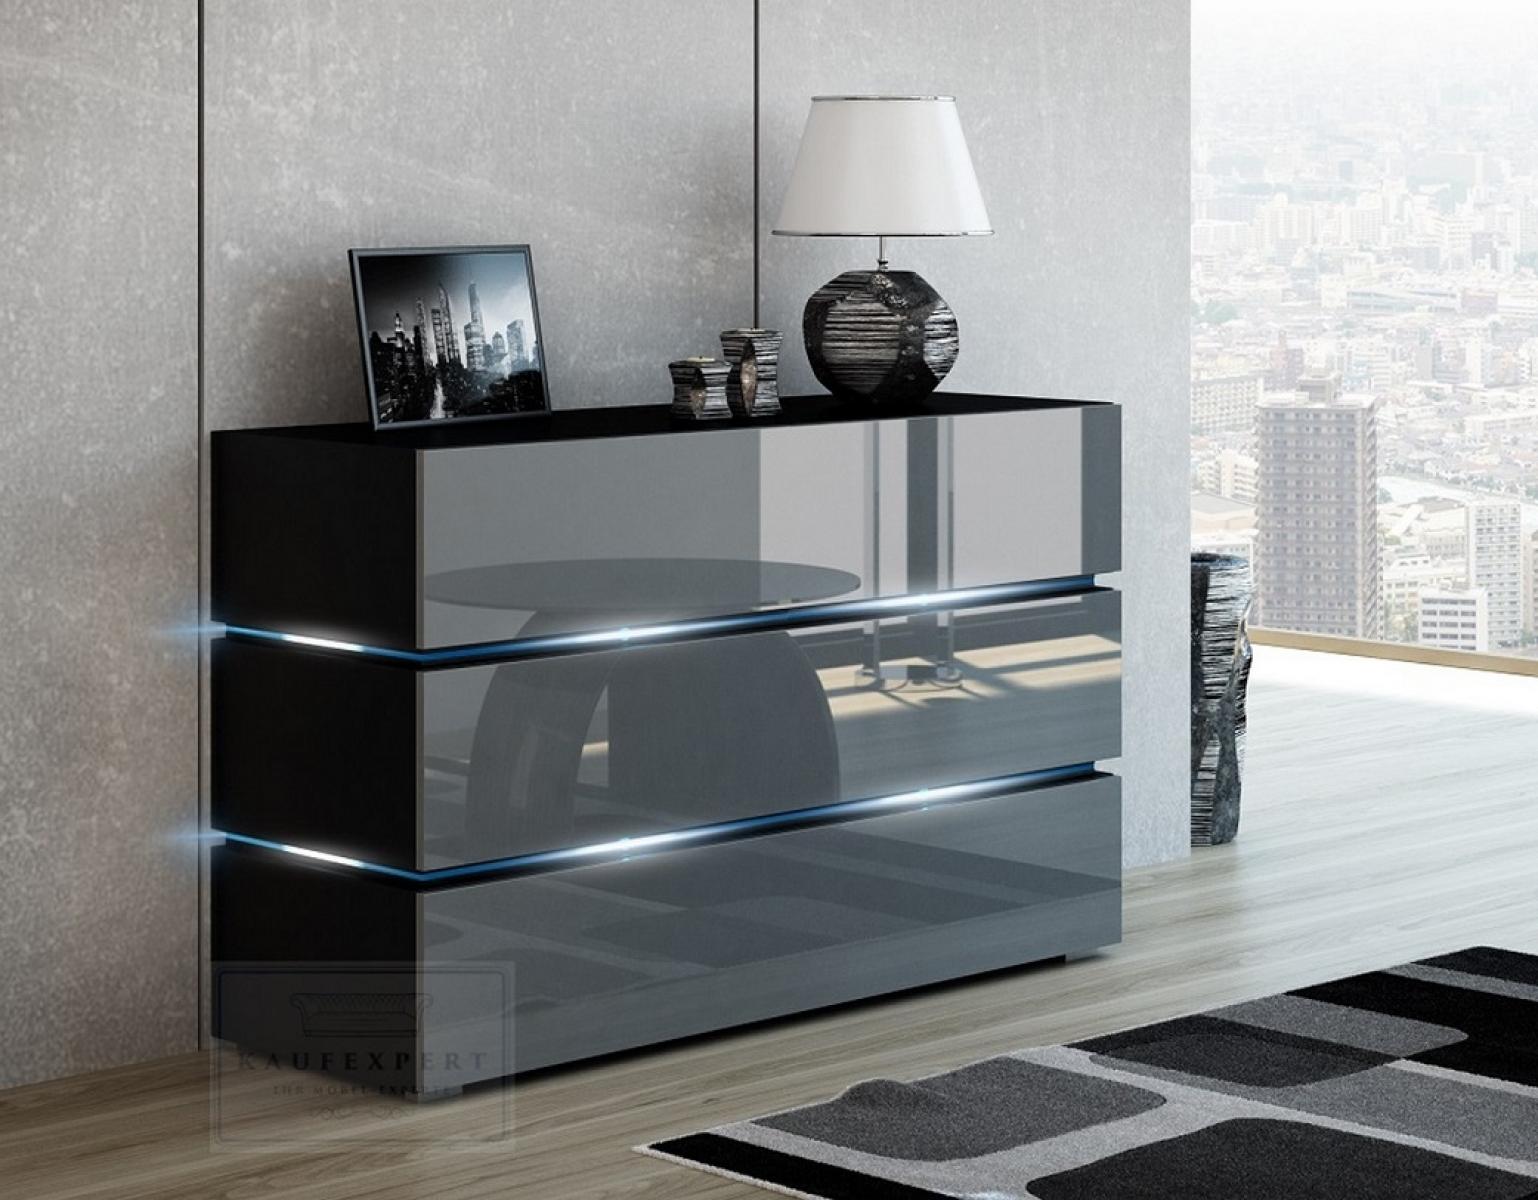 Massivholzmöbel sideboard modern  KAUFEXPERT - Kommode Shine Sideboard 90 cm Grau Hochglanz/Schwarz ...